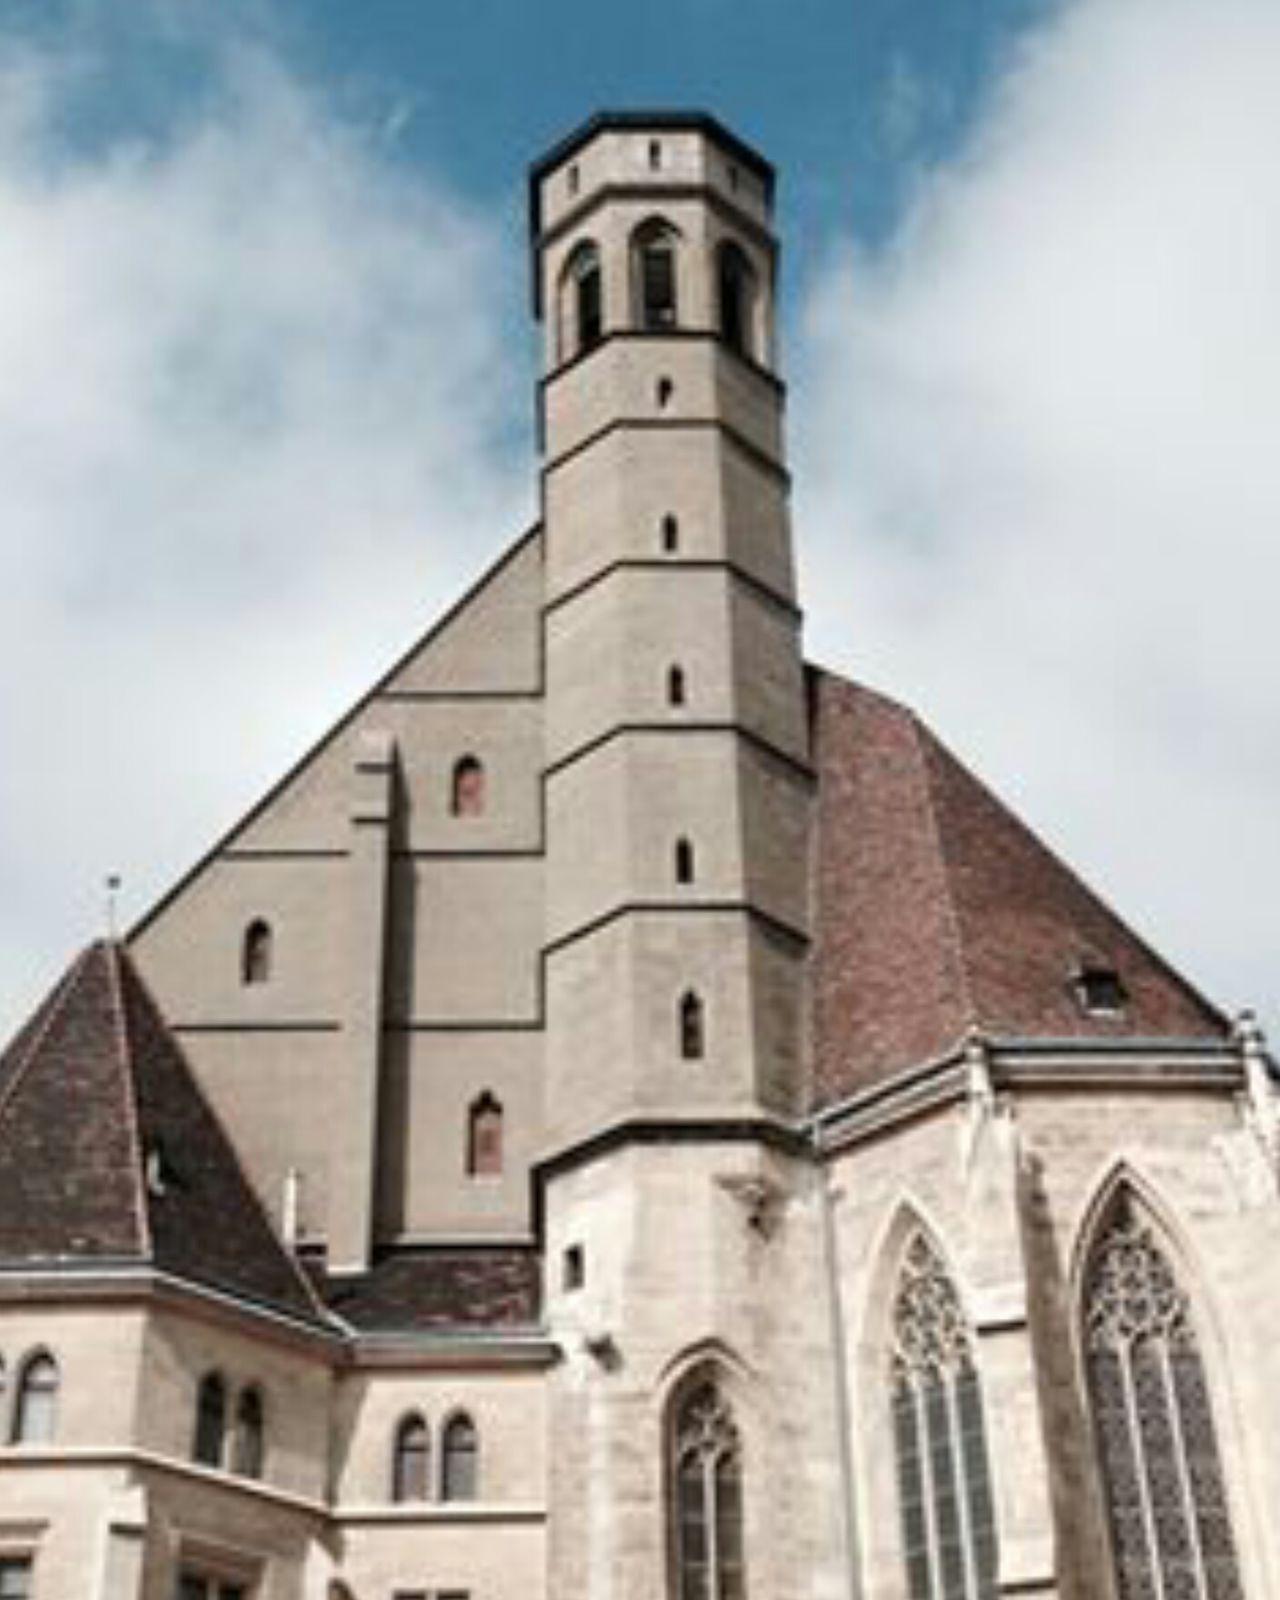 Architecture Low Angle View Building Exterior Sky Built Structure Motivkirche